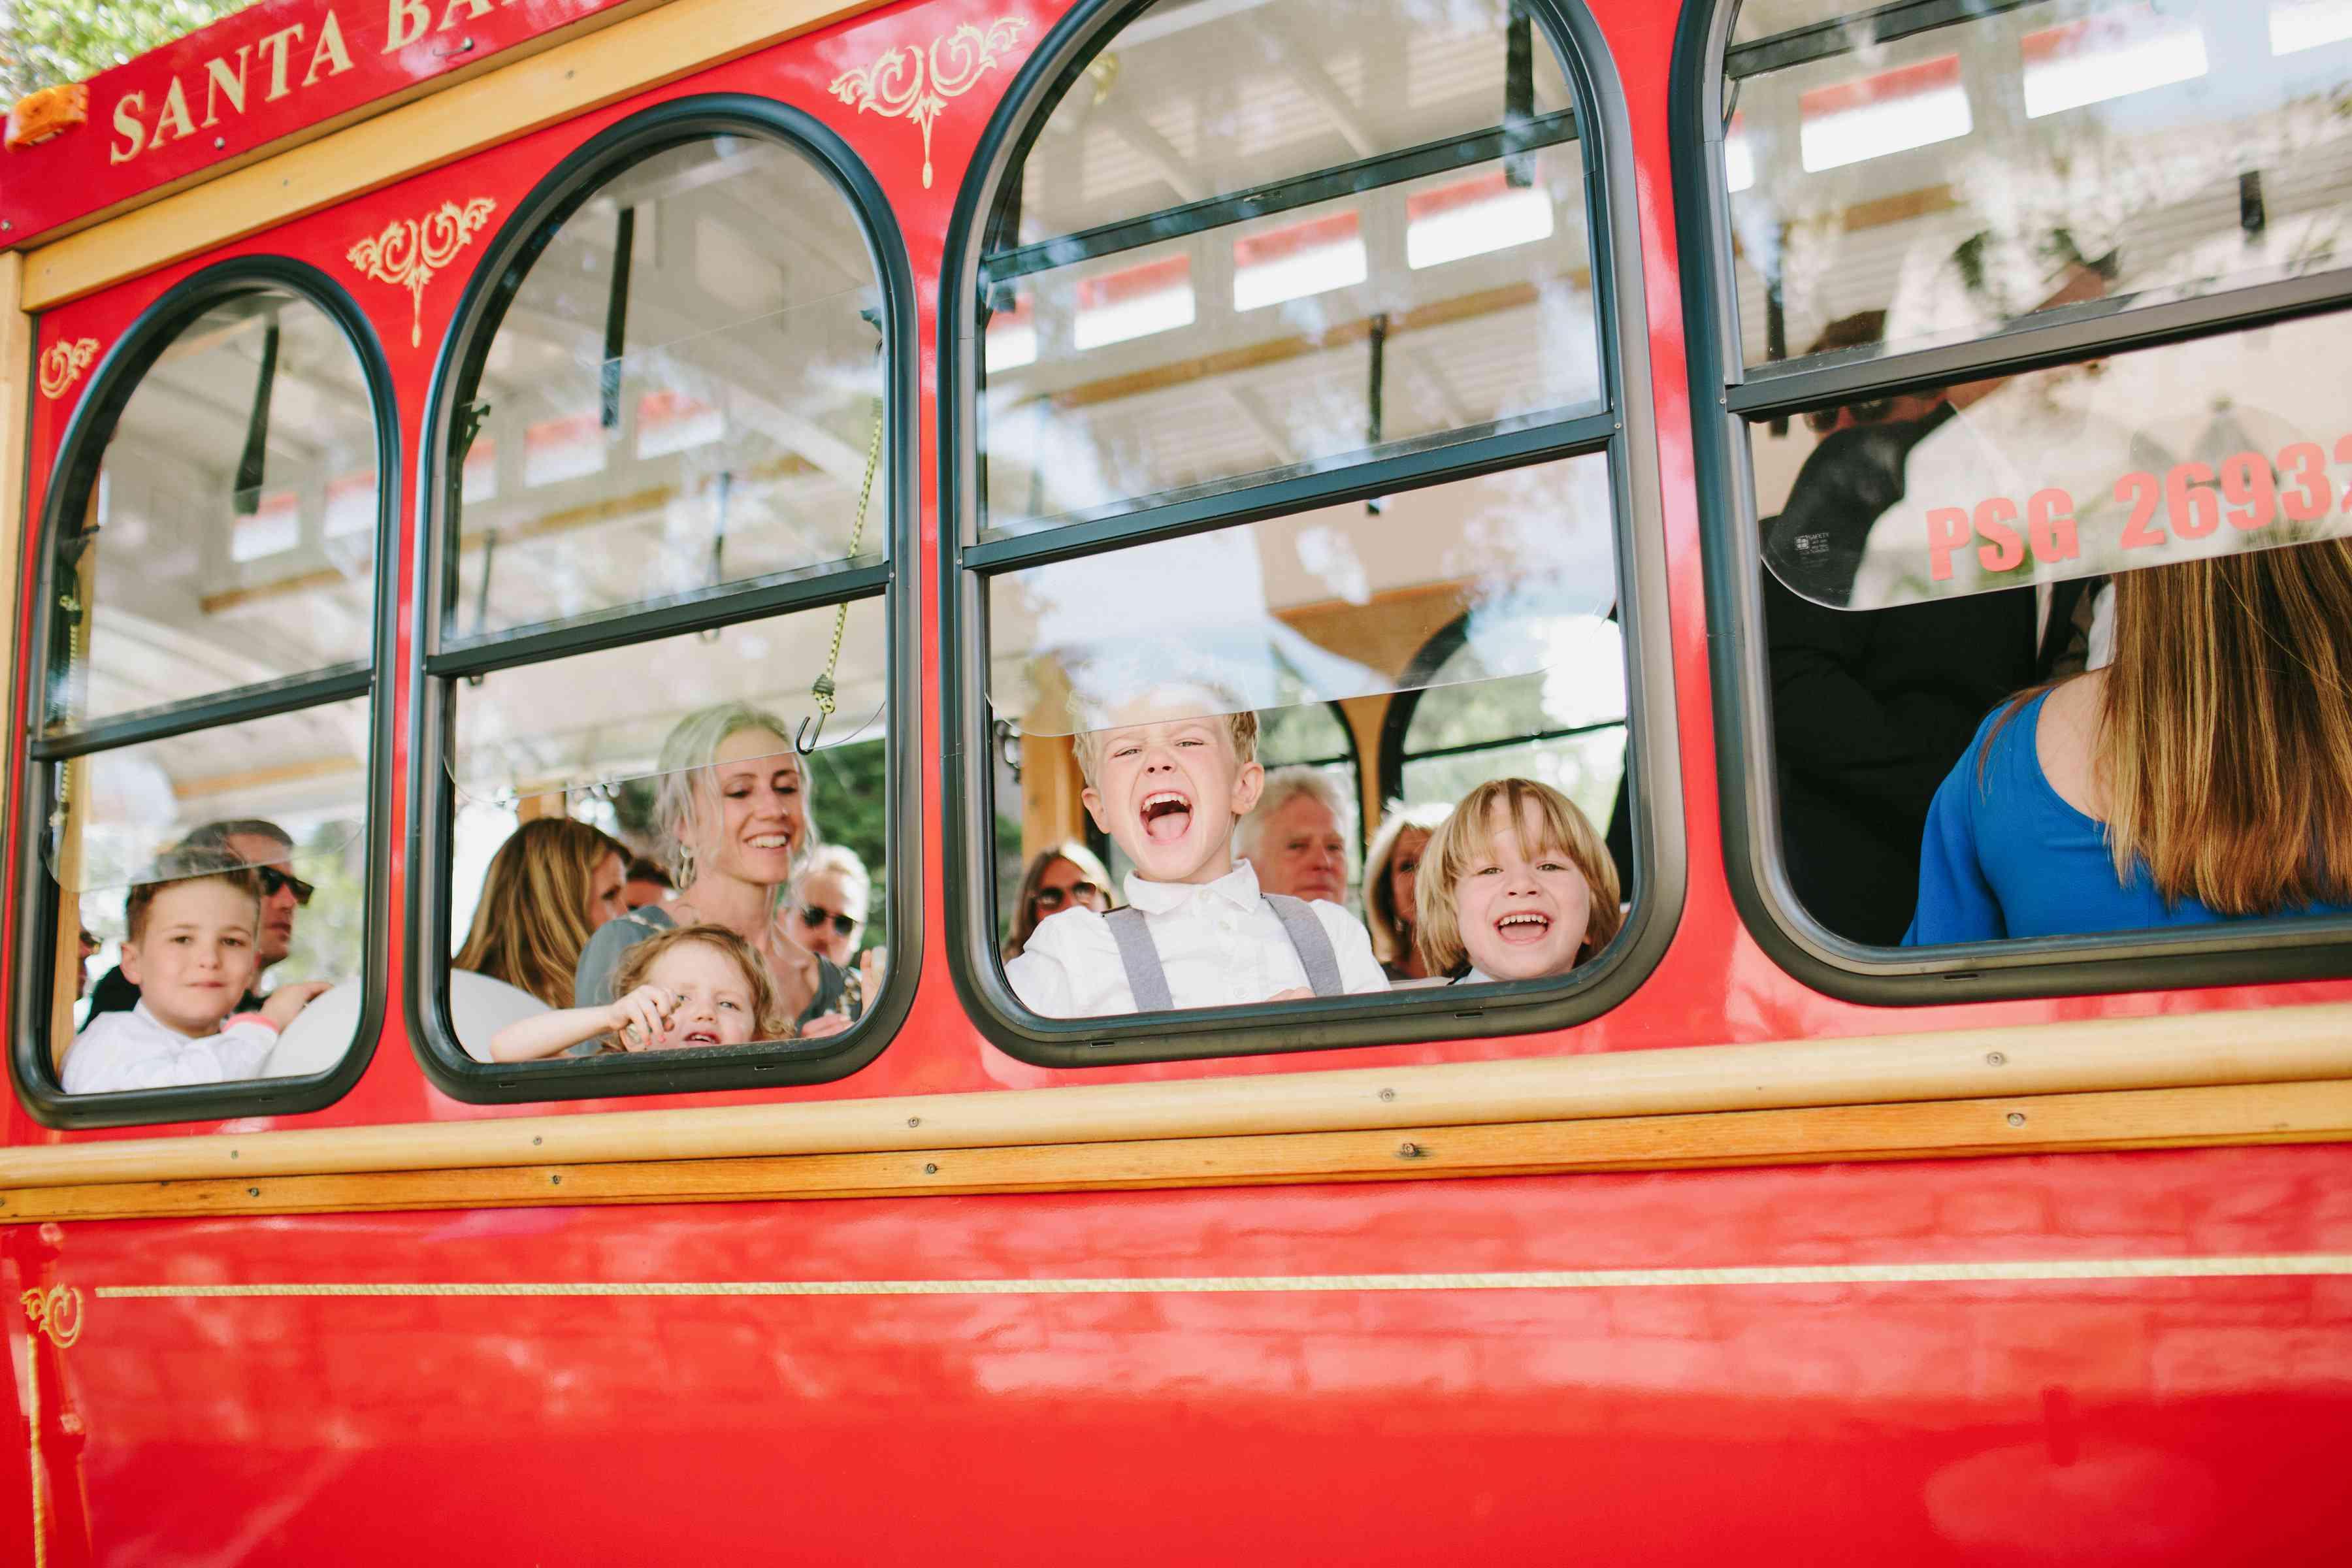 <p>trolly wedding transportation</p><br><br>